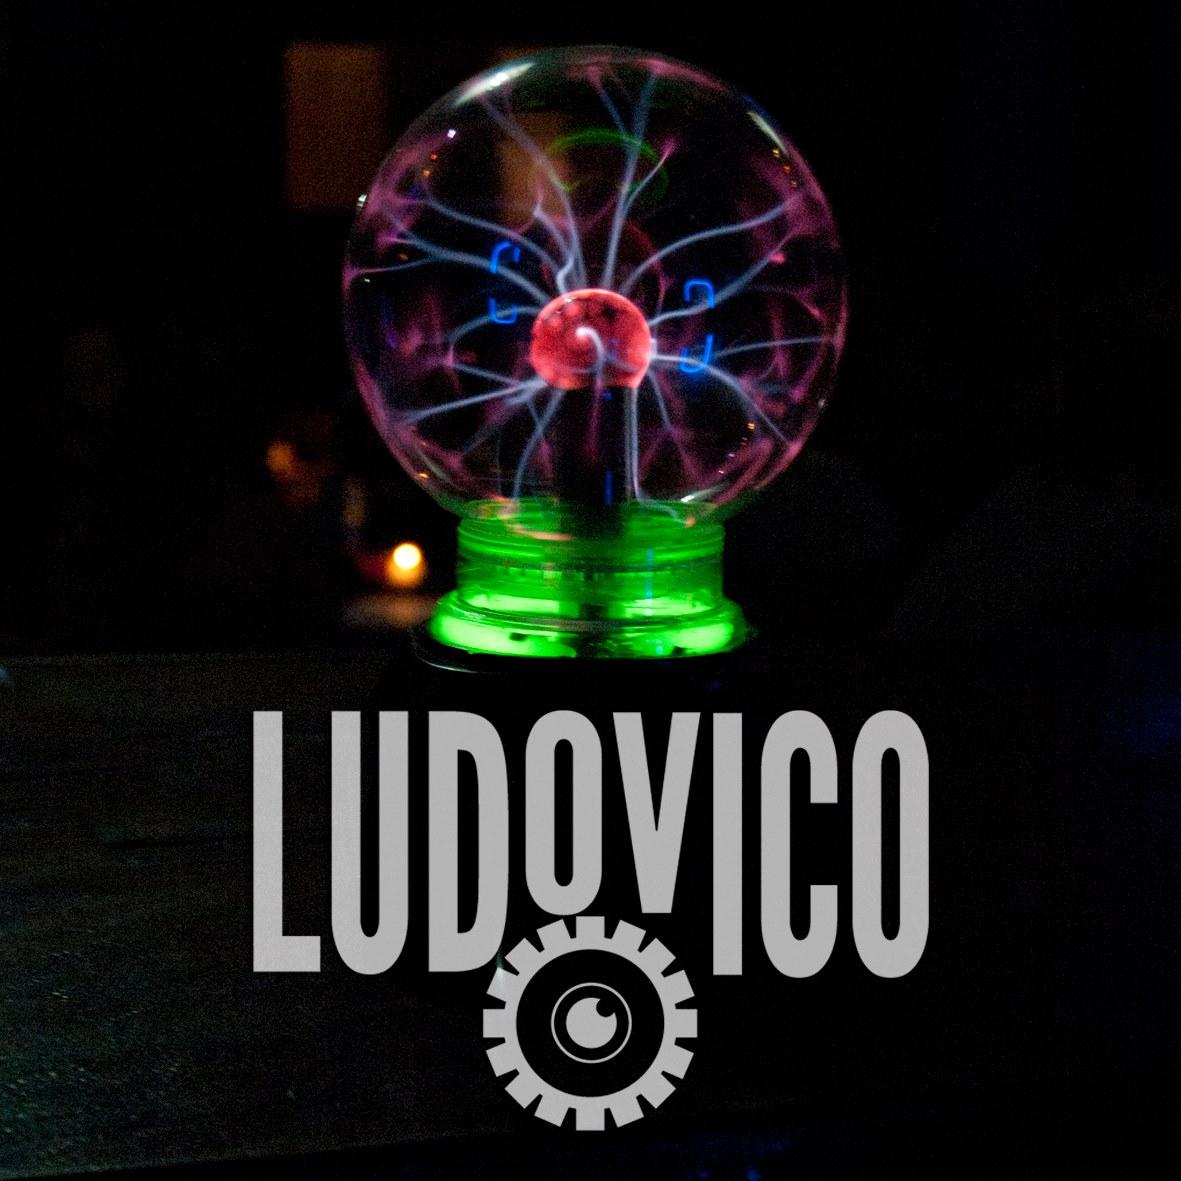 Logo de Ludovico